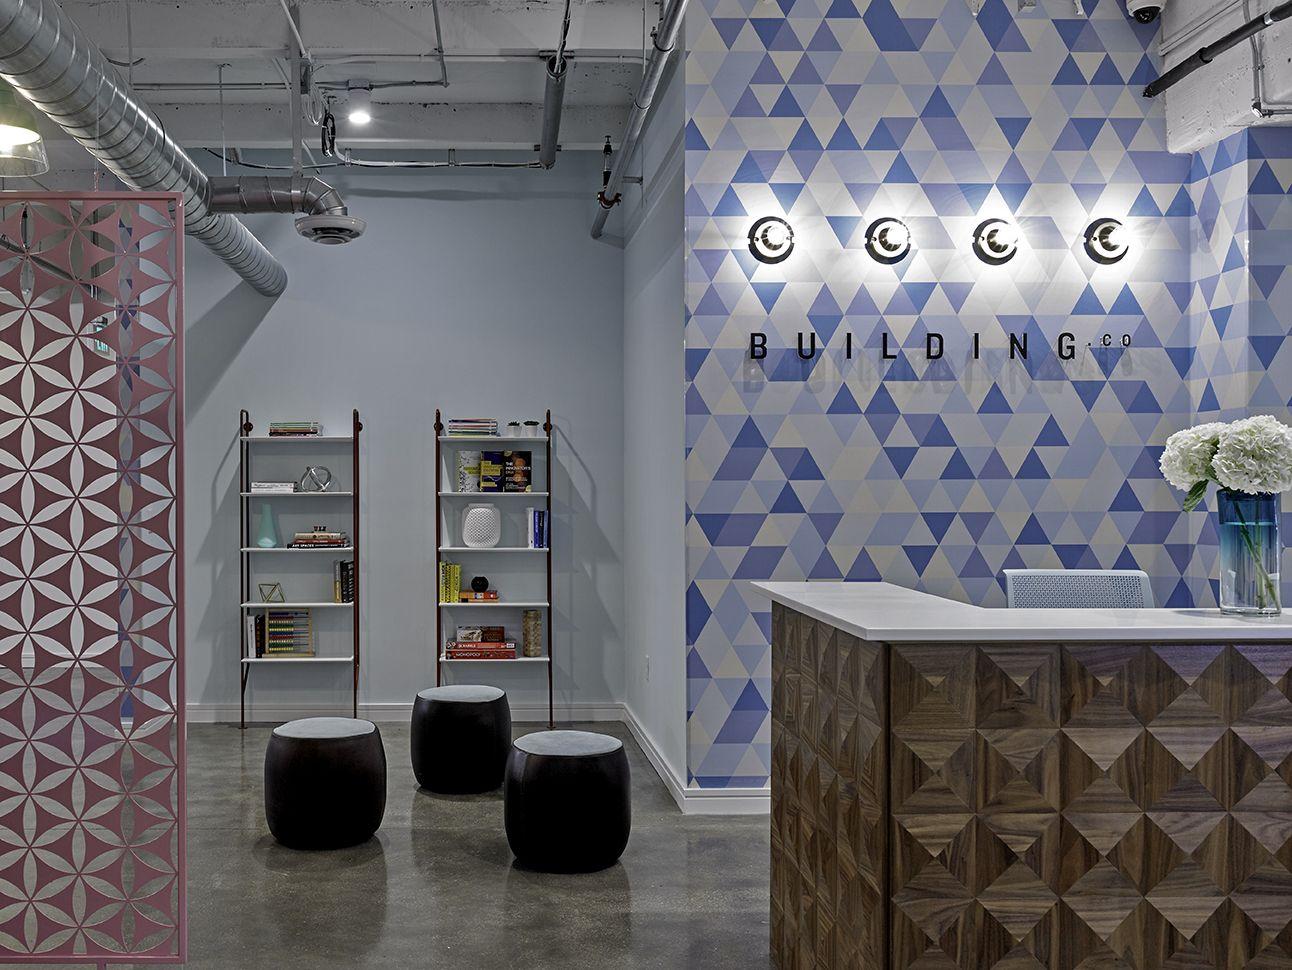 Sergio Vergara BUILDING.CO MIAMI - Αναζήτηση Google